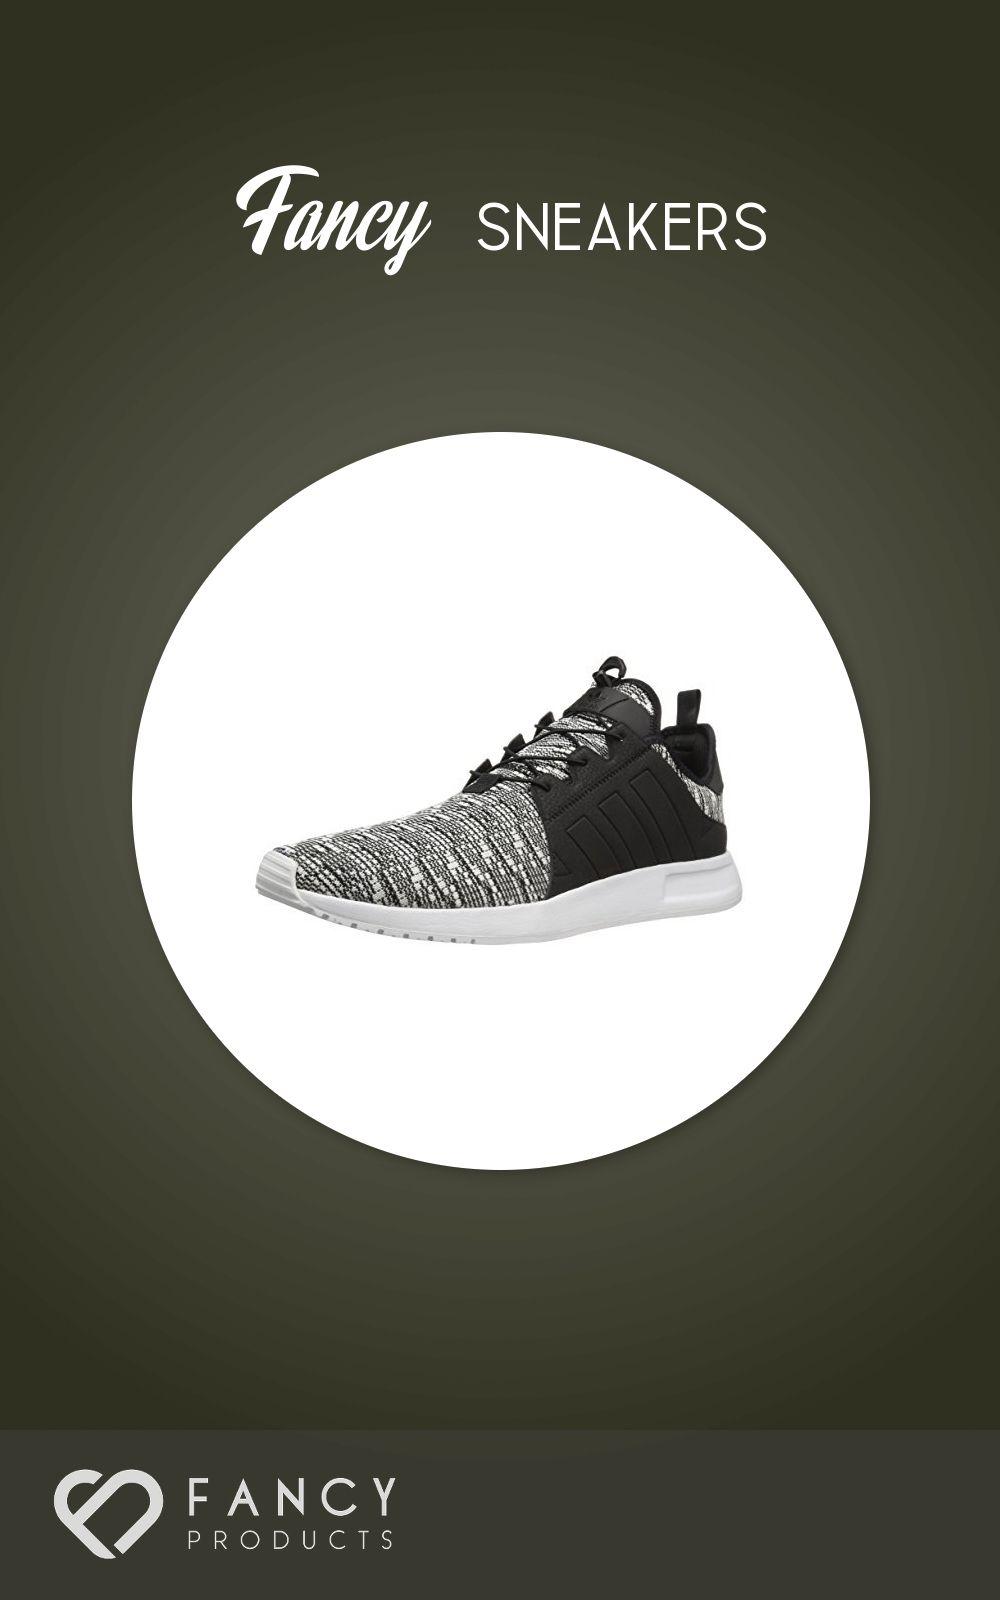 cómo Suburbio Buen sentimiento  85$ - adidas Originals Men s X_PLR Fashion Sneaker- Black/White- 13 M US  from adidas- These running-inspired l…   Fancy sneakers, Adidas originals  women, Womens nmd